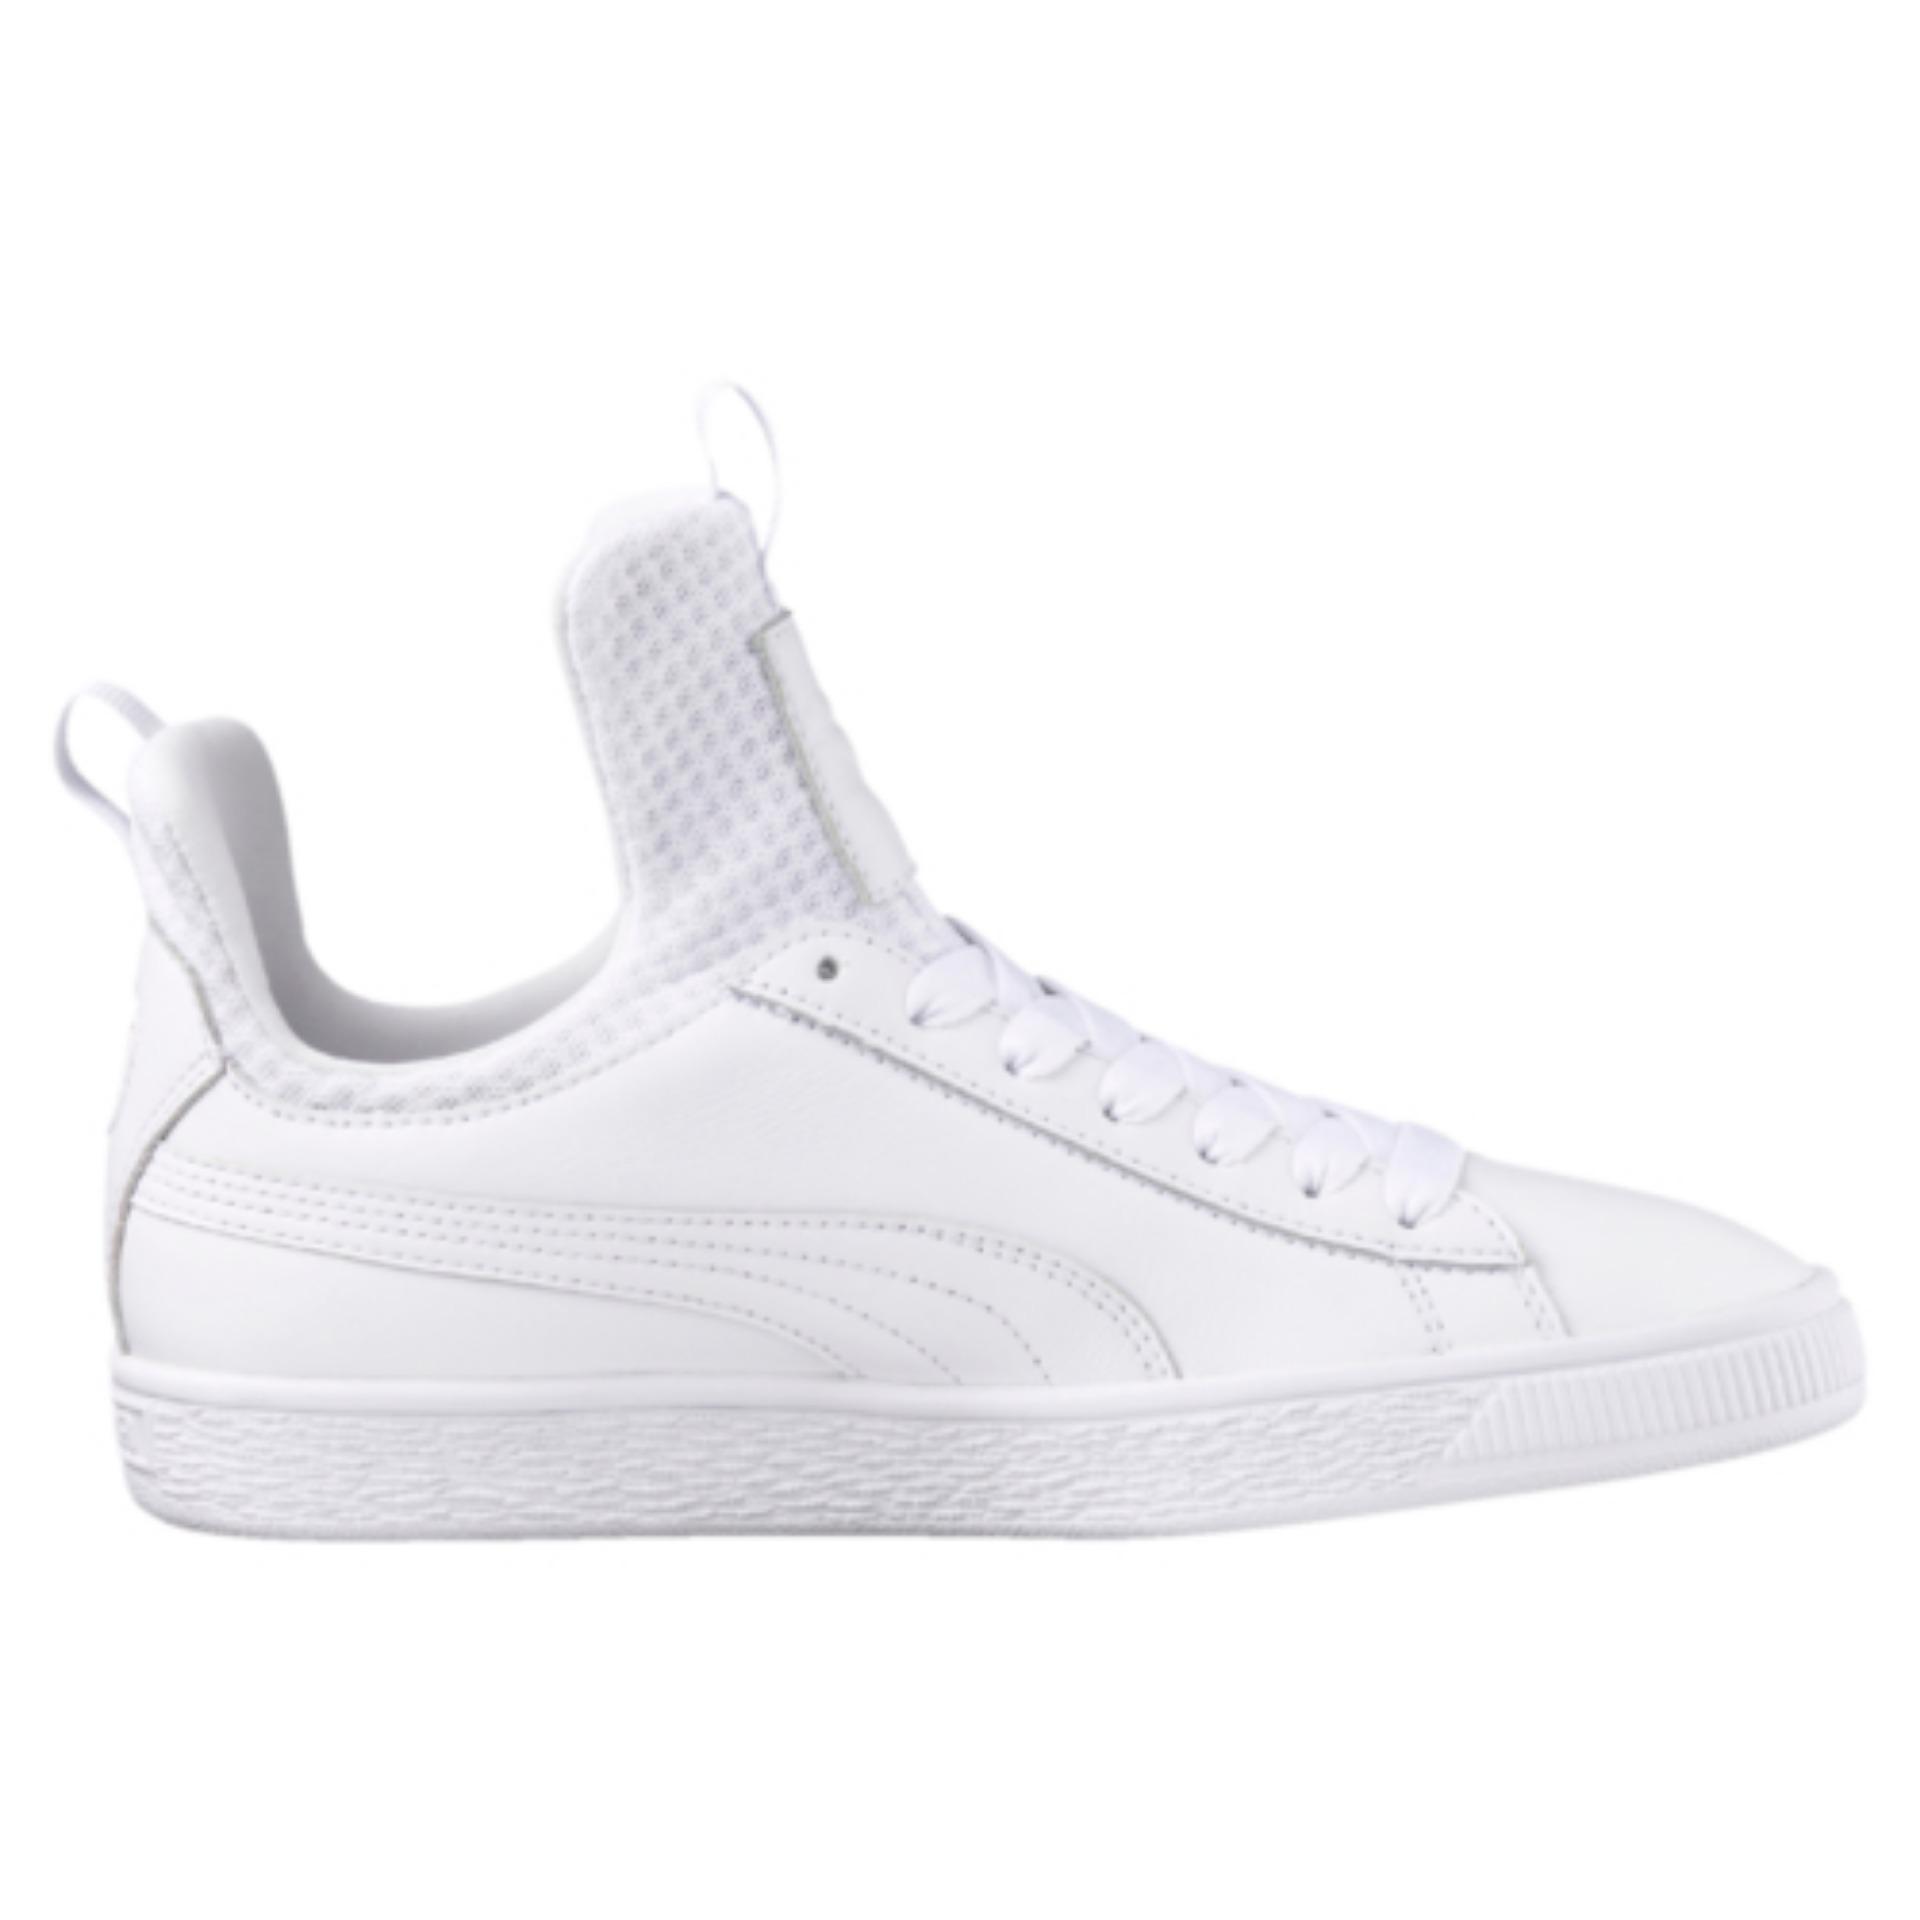 Puma Basket Fierce EP Women Sneakers - Puma White f46af7479